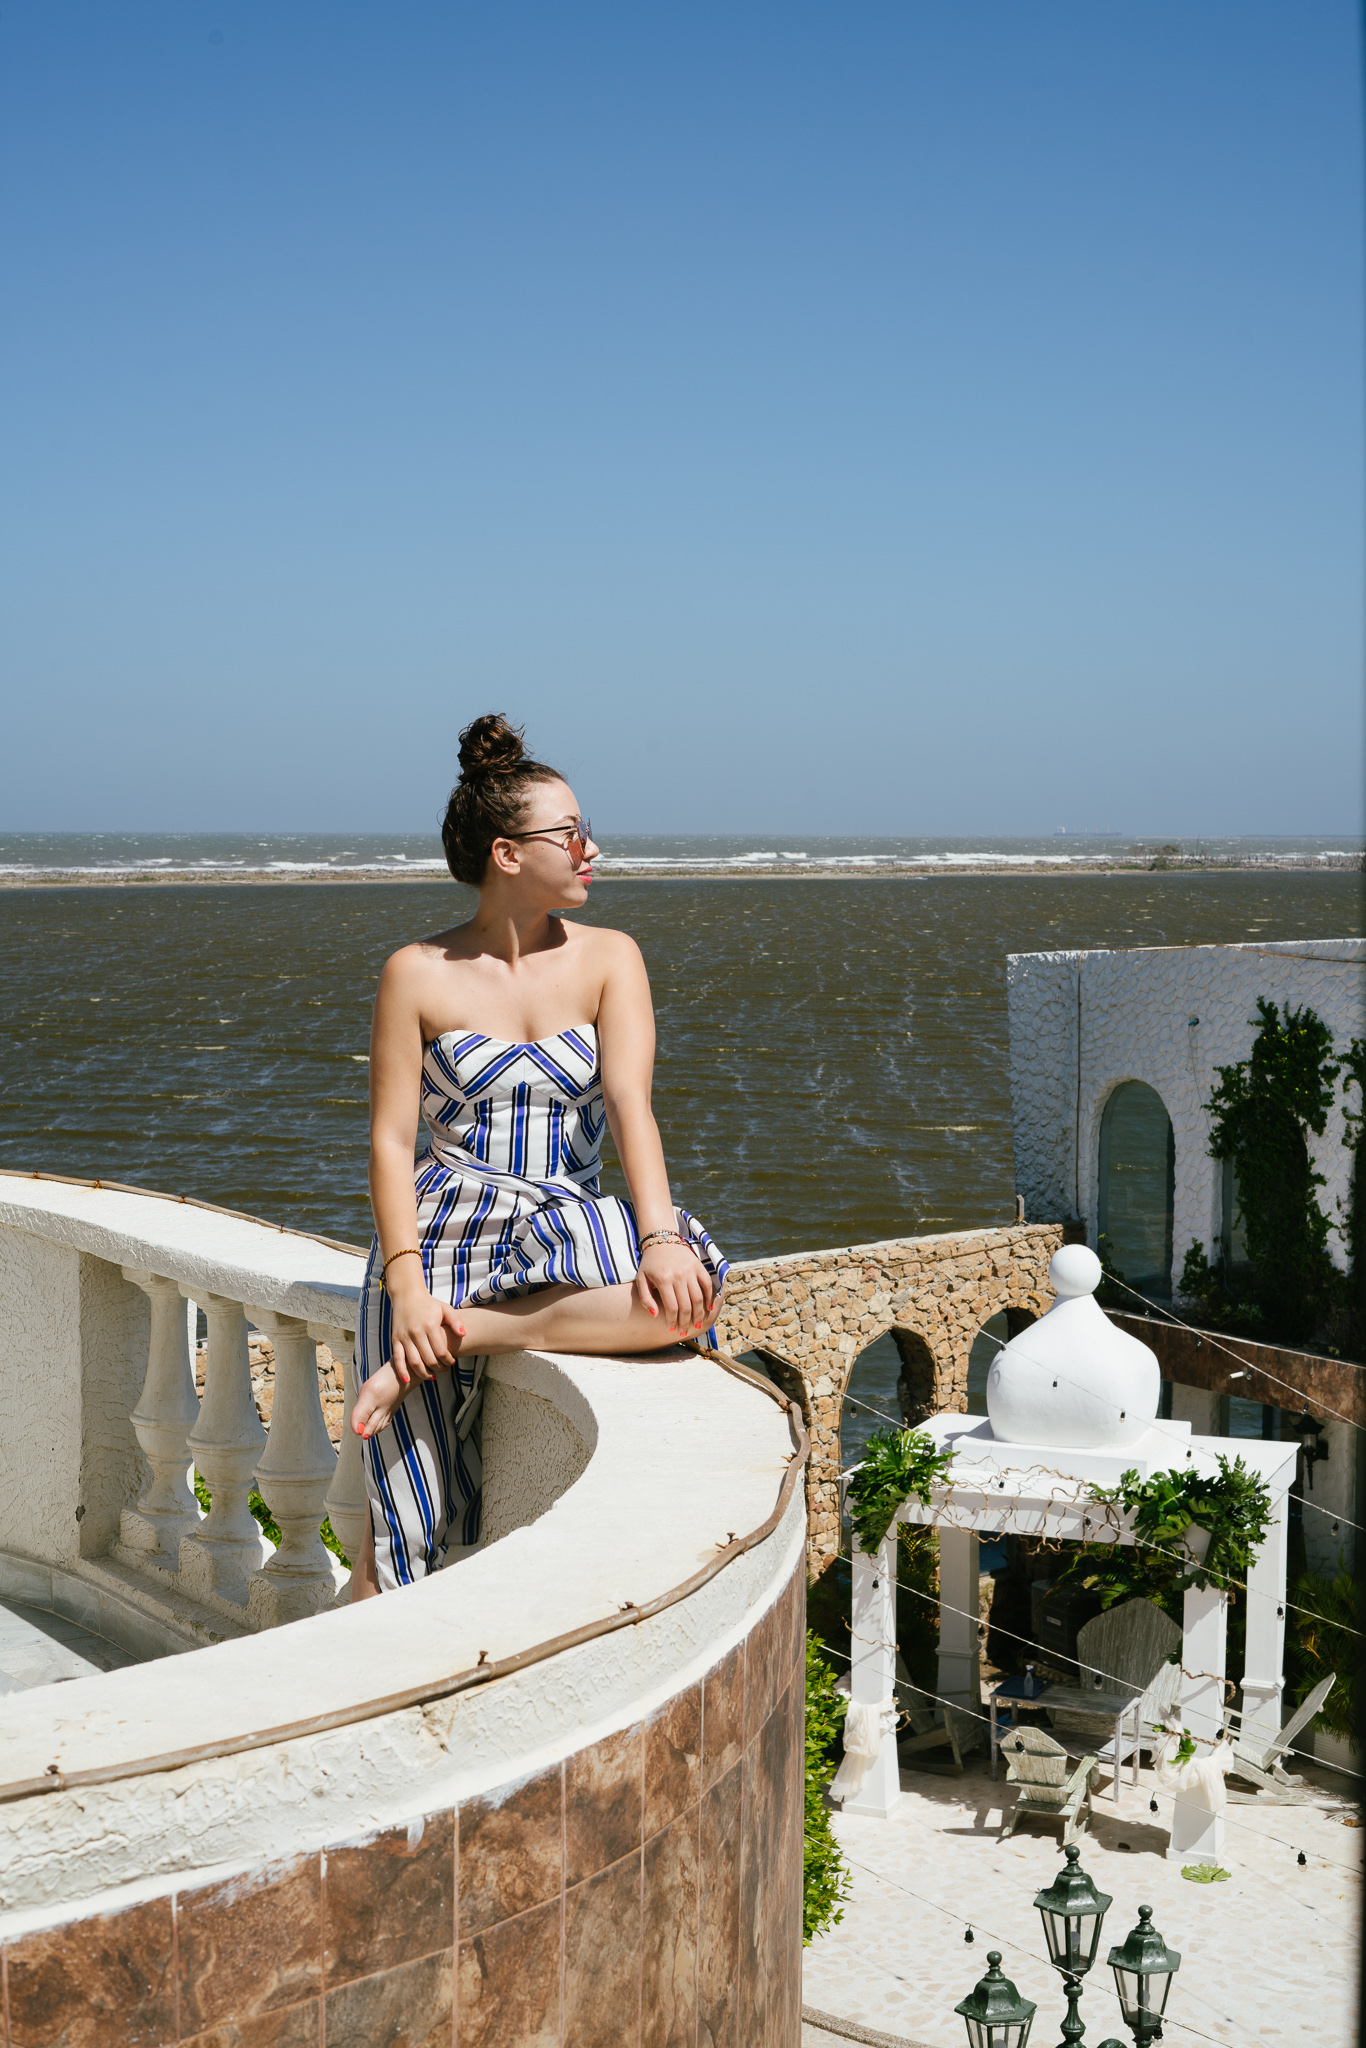 Barranquilla, Colombia | Photo Diary